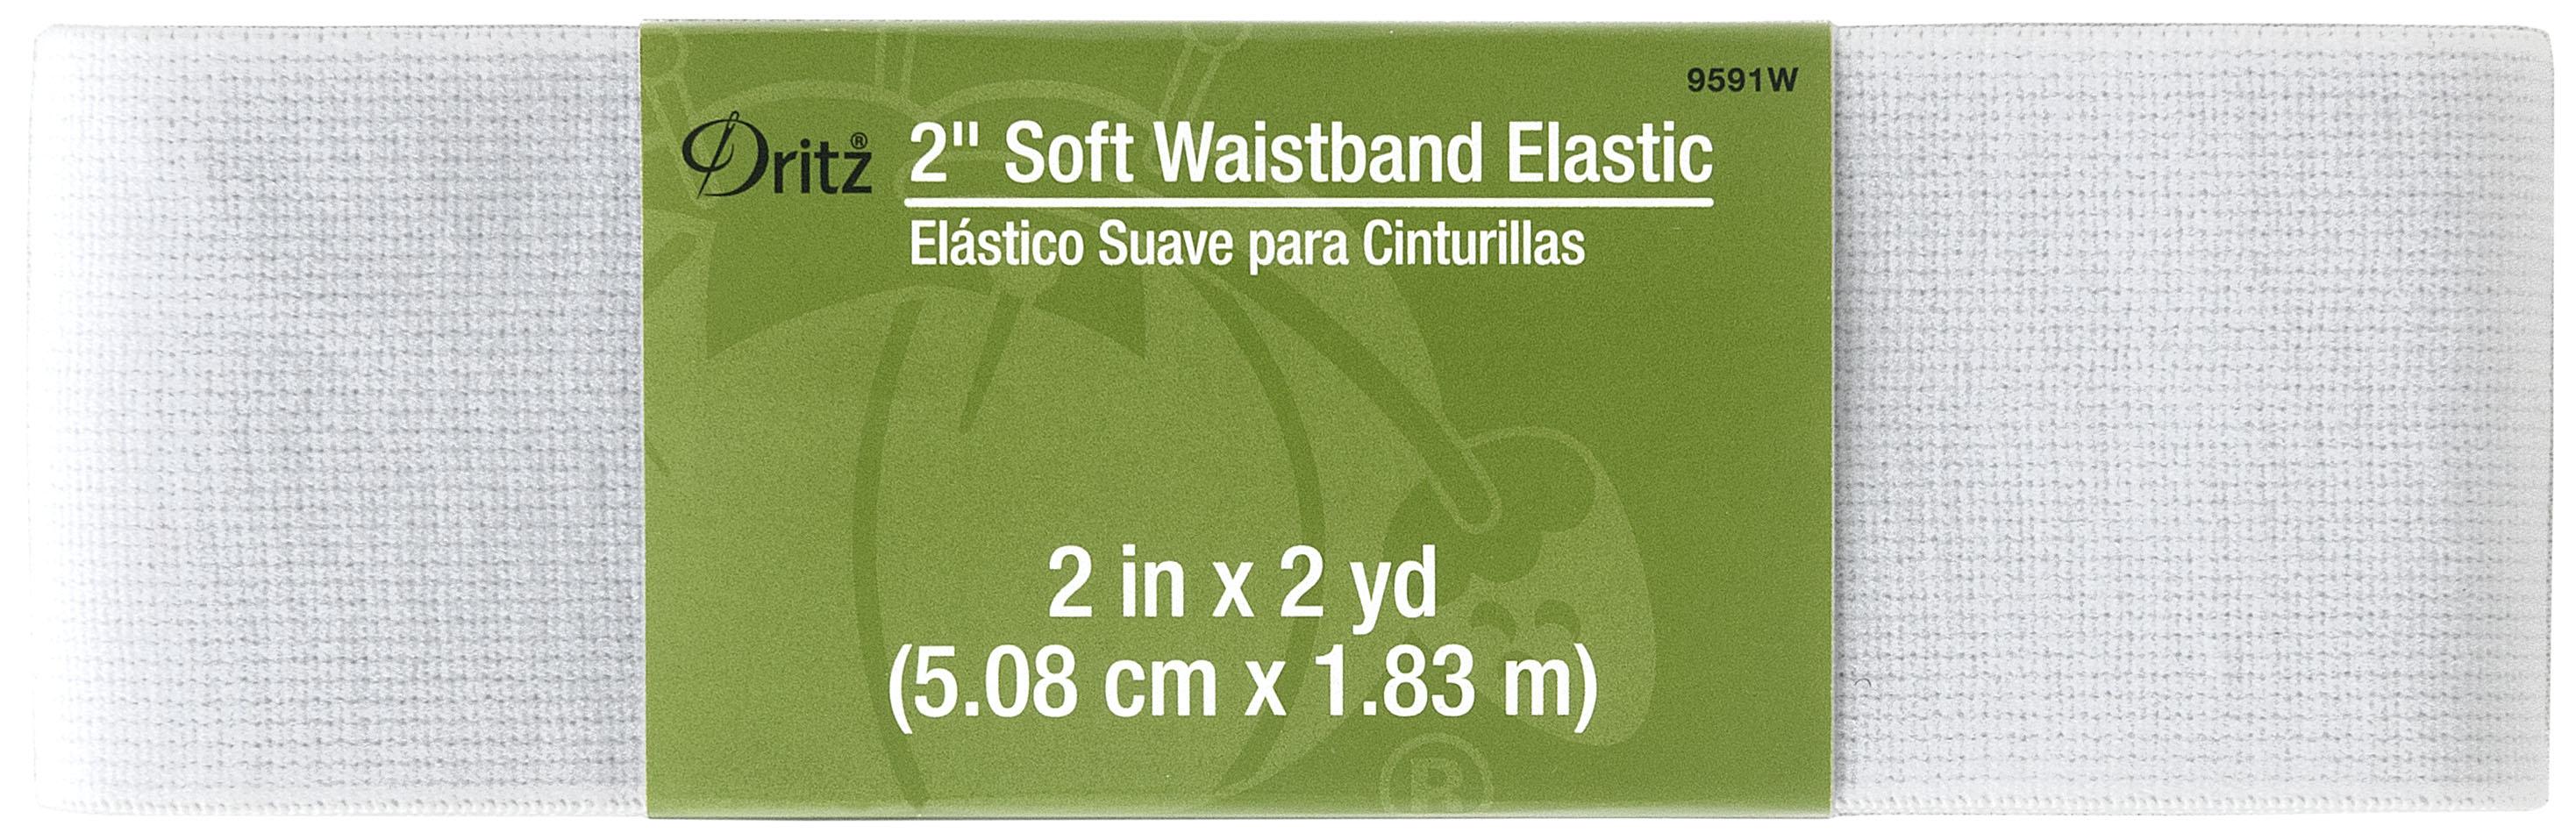 2x2yrds Soft Waistband Elastic White